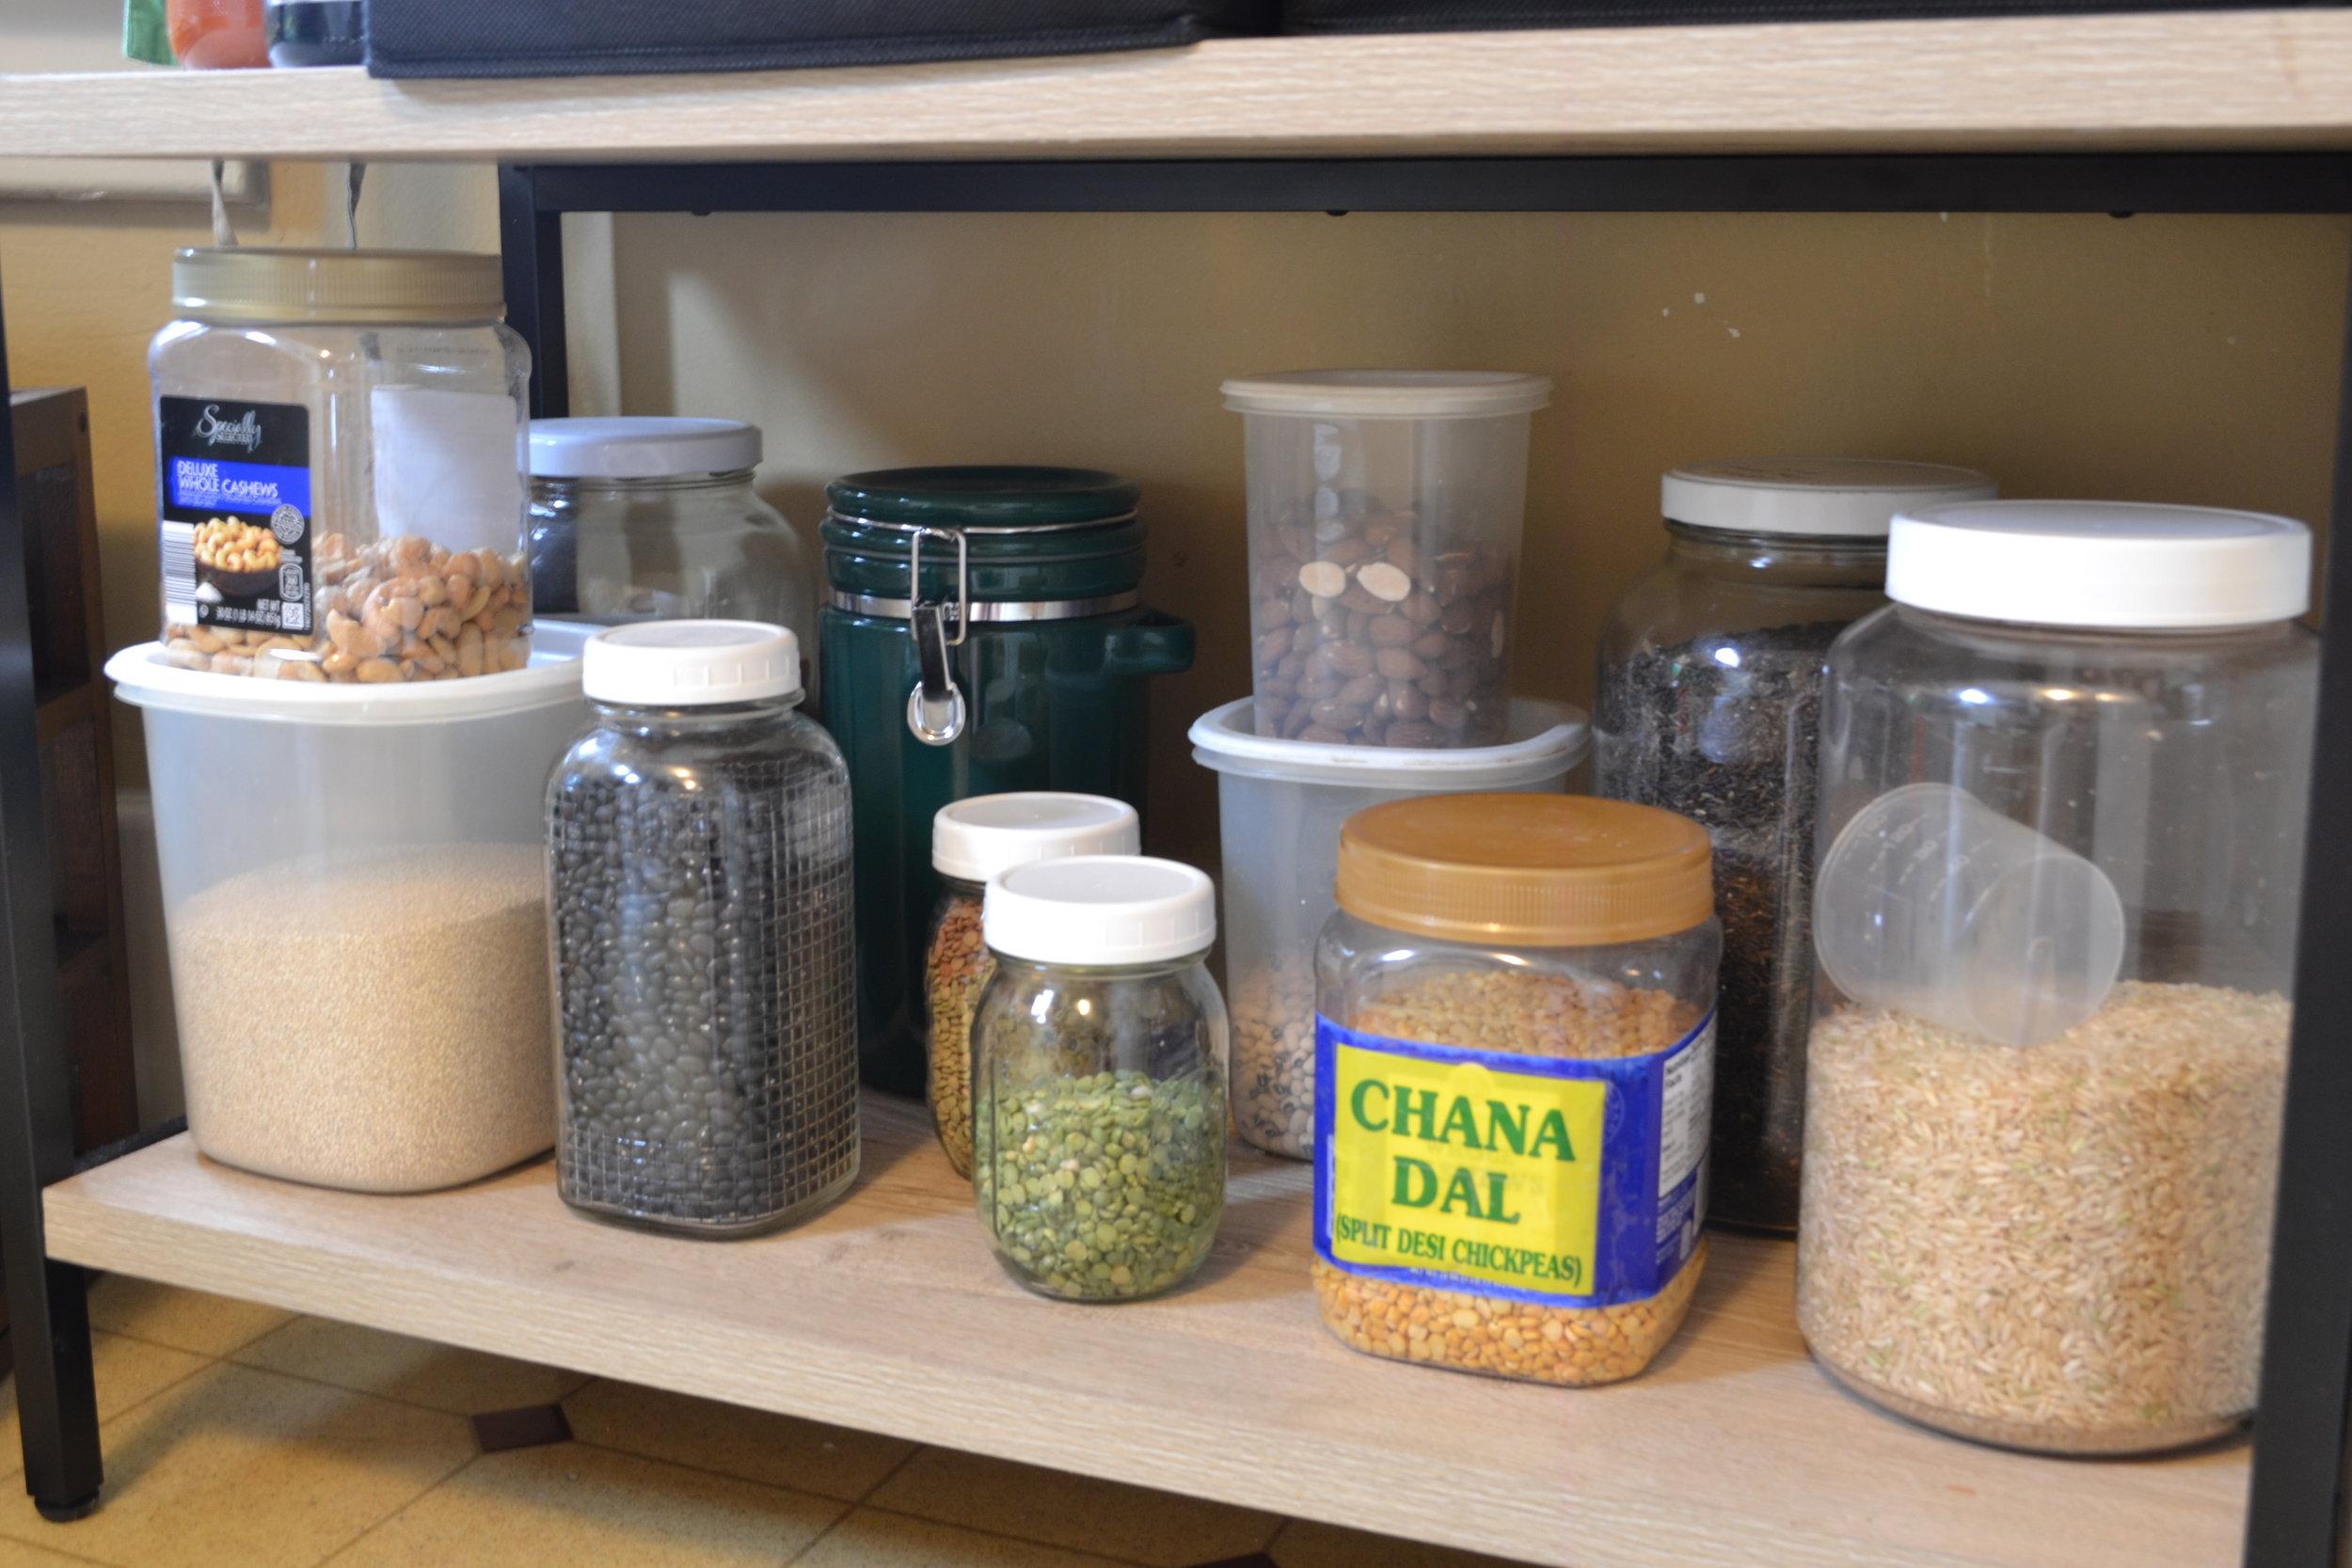 Kitchen storage for dry goods.